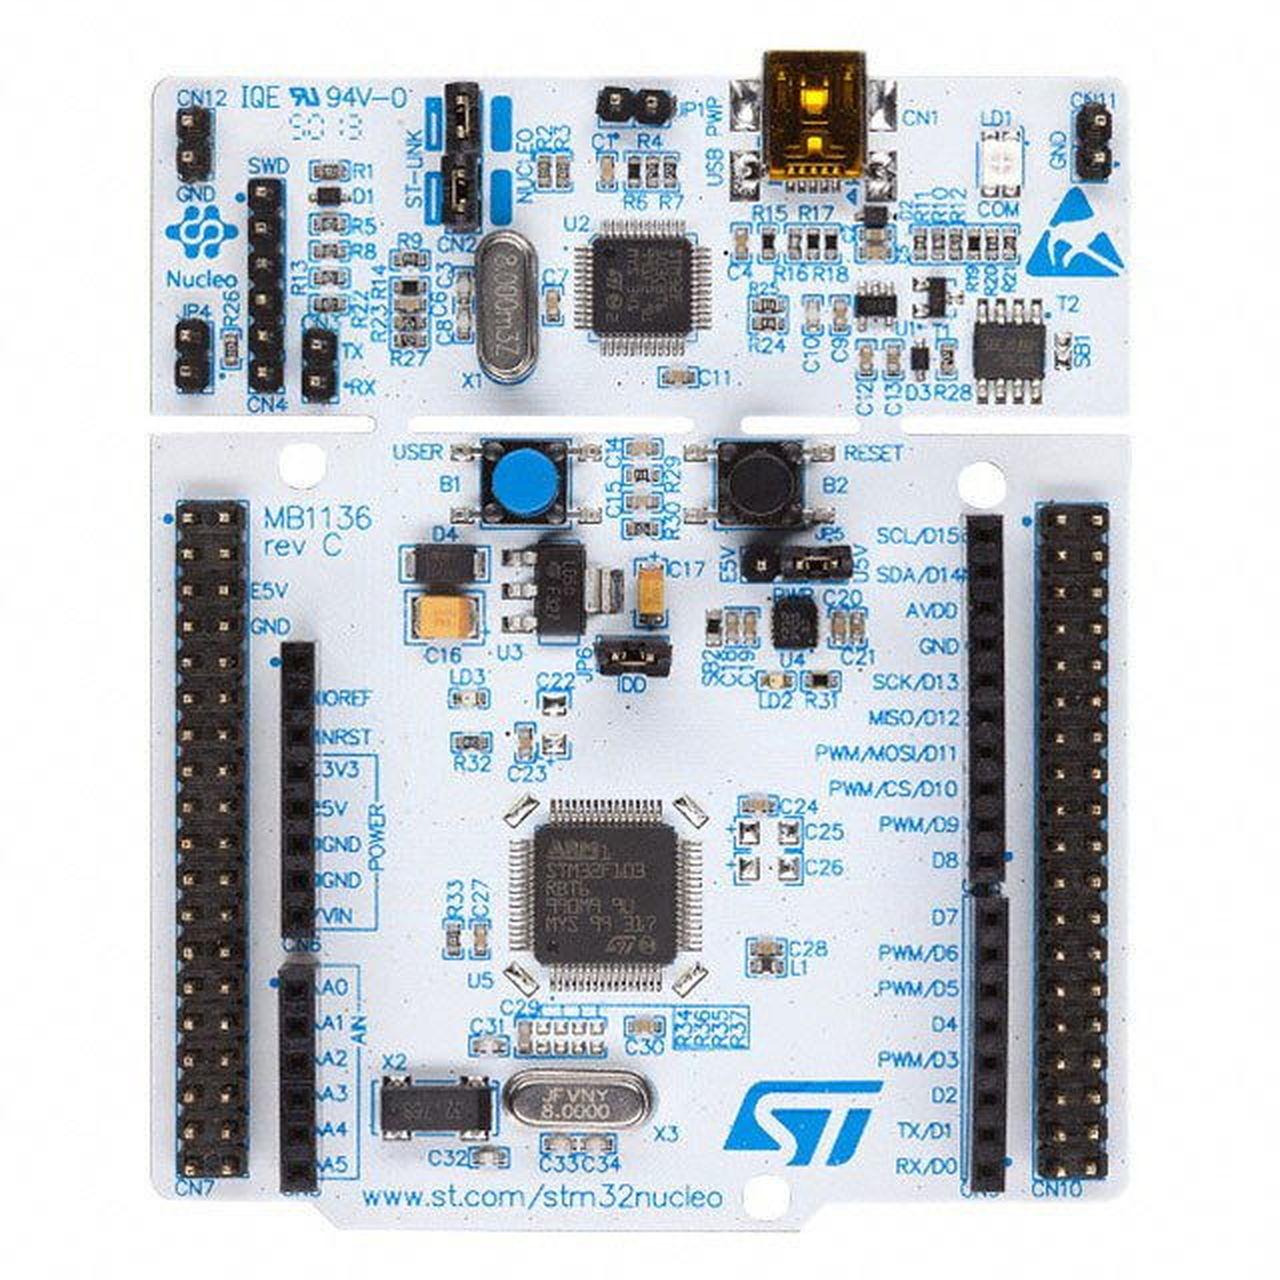 Tarjeta STM32 Nucleo 64 Con procesor ARM Cortex M4